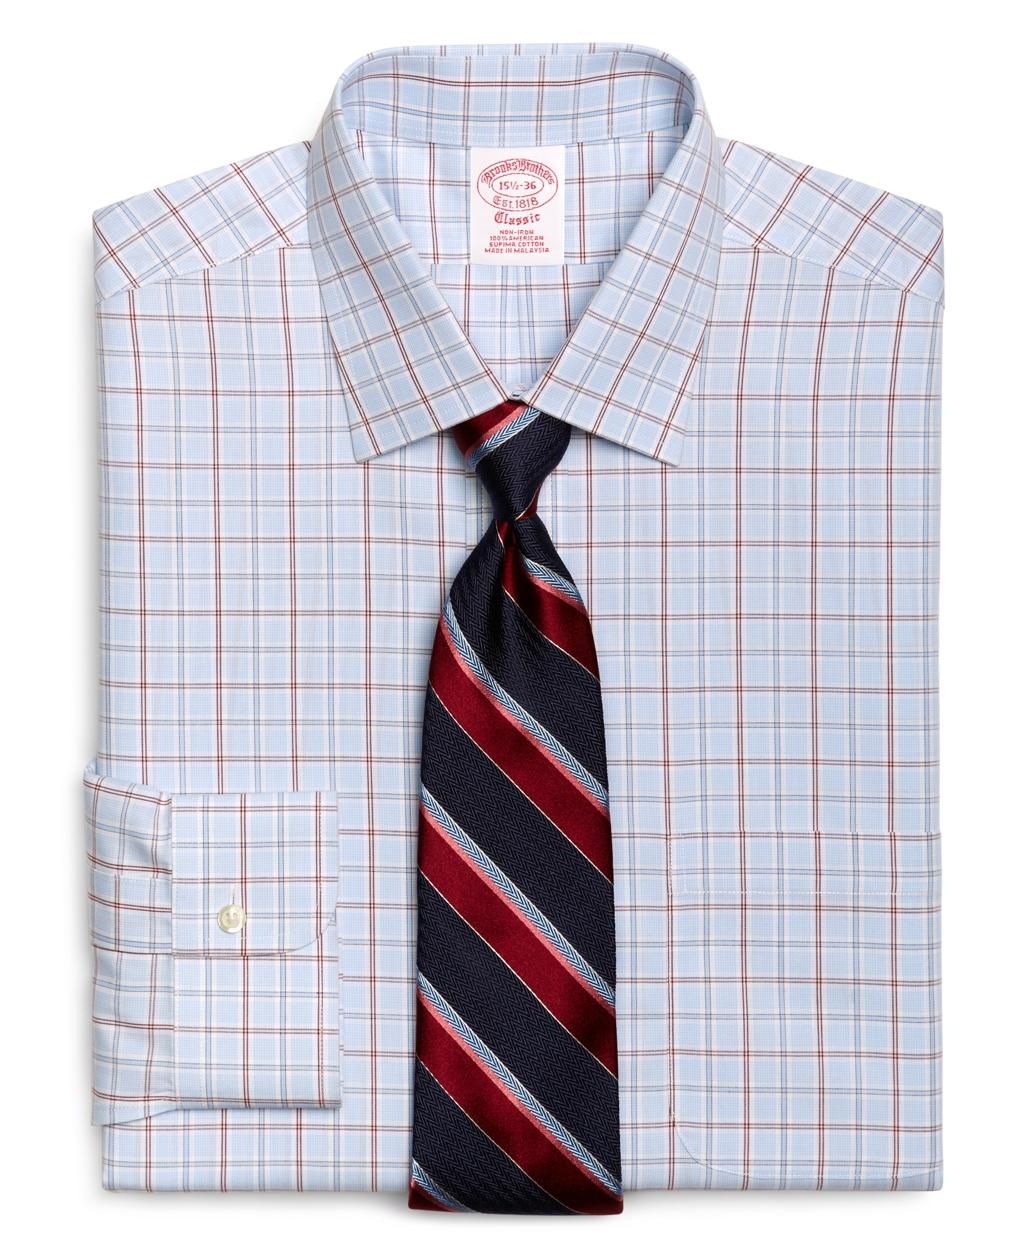 Lyst brooks brothers supima cotton noniron traditional for Supima cotton dress shirts